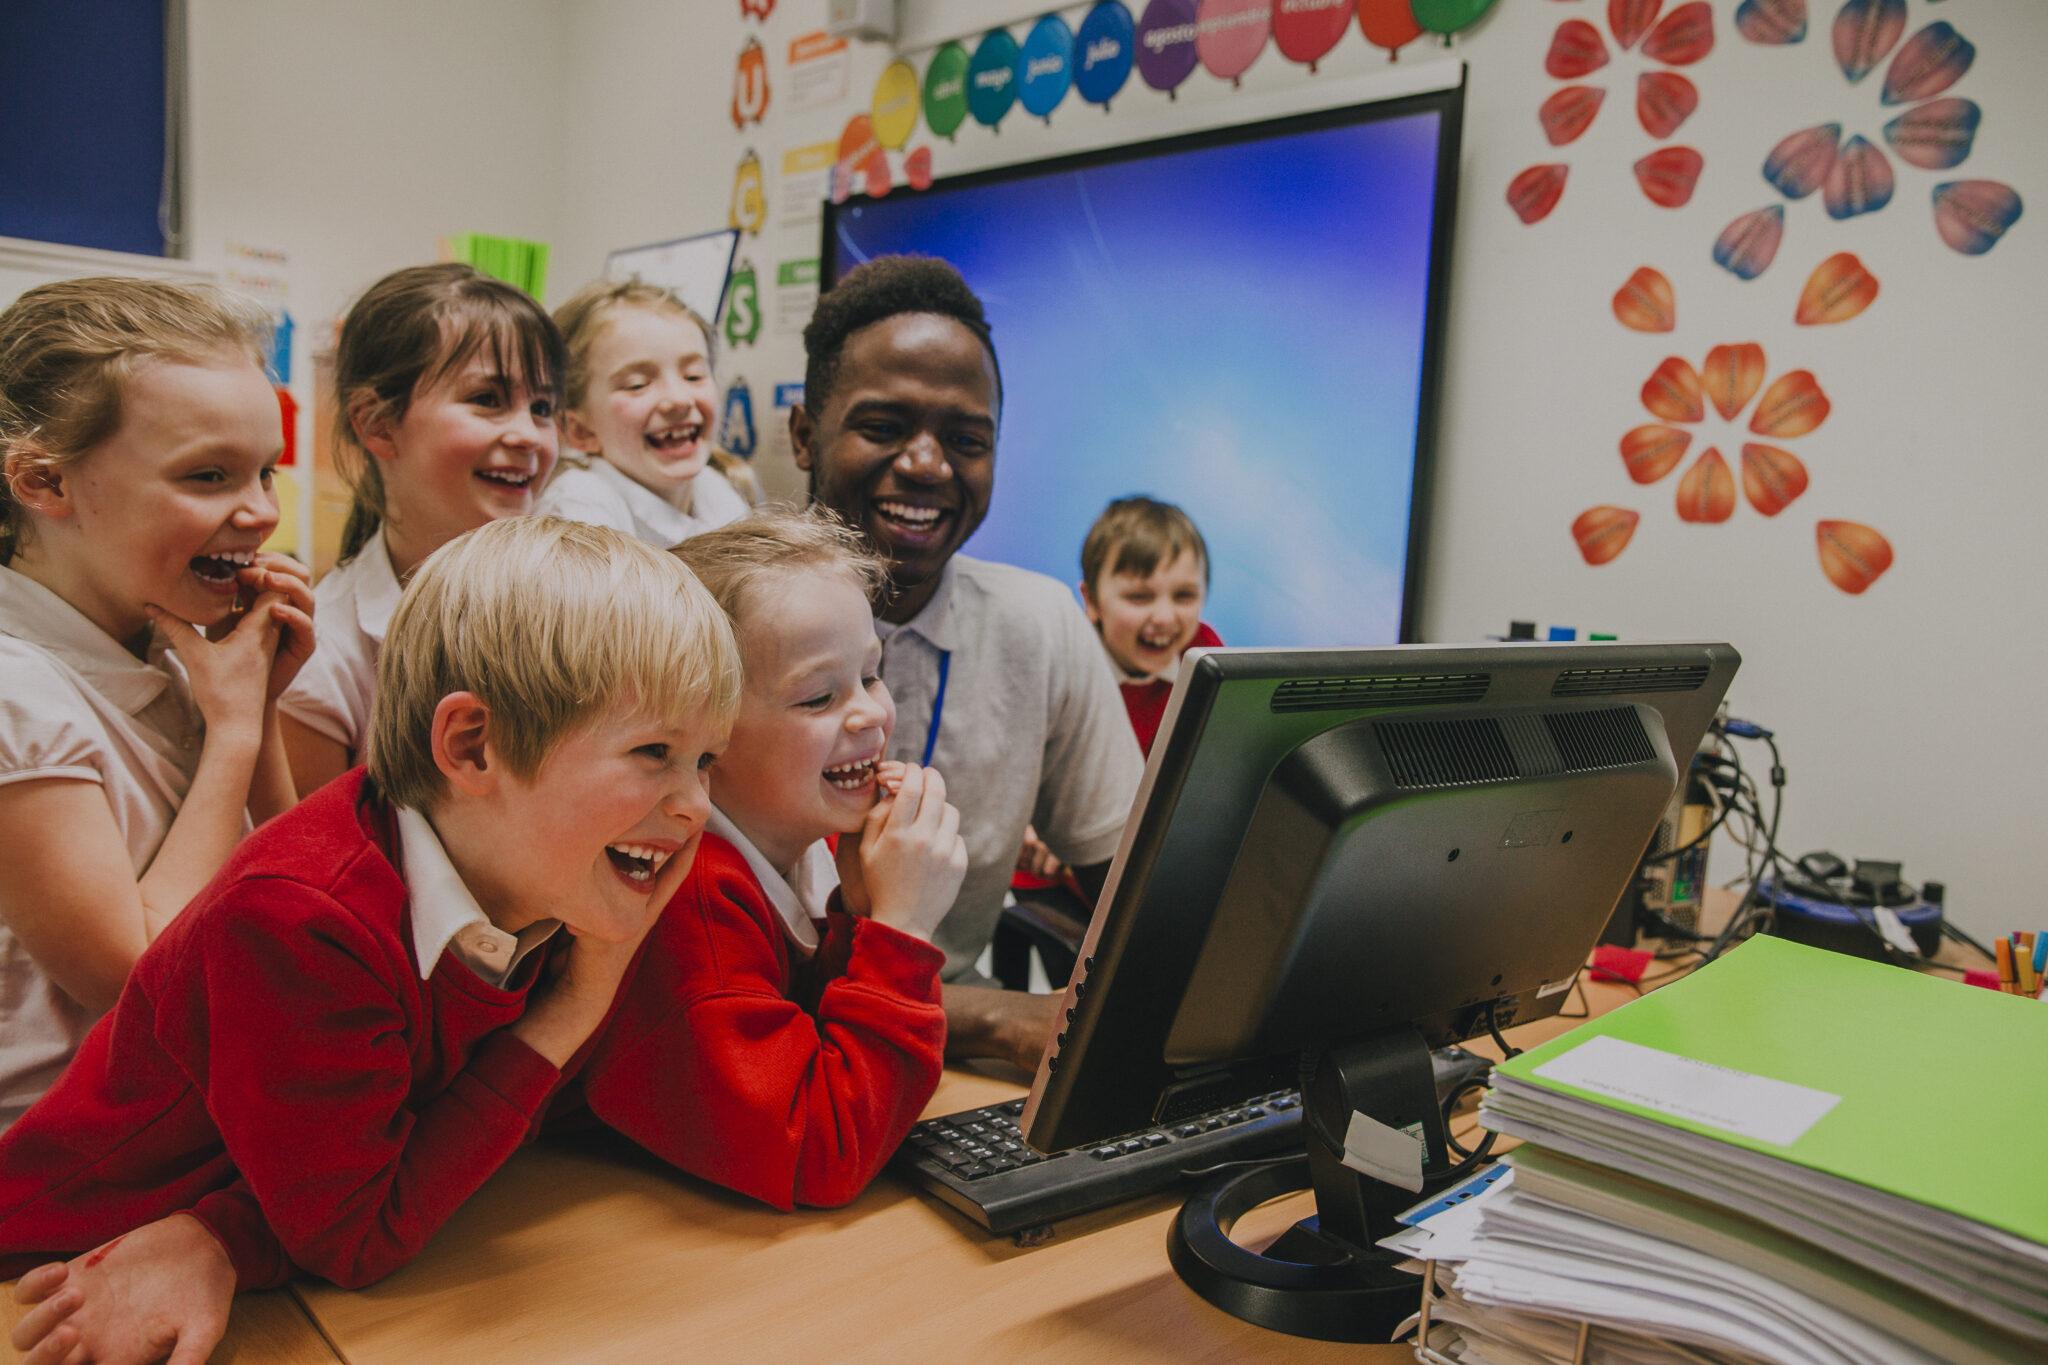 teacher managing classroom